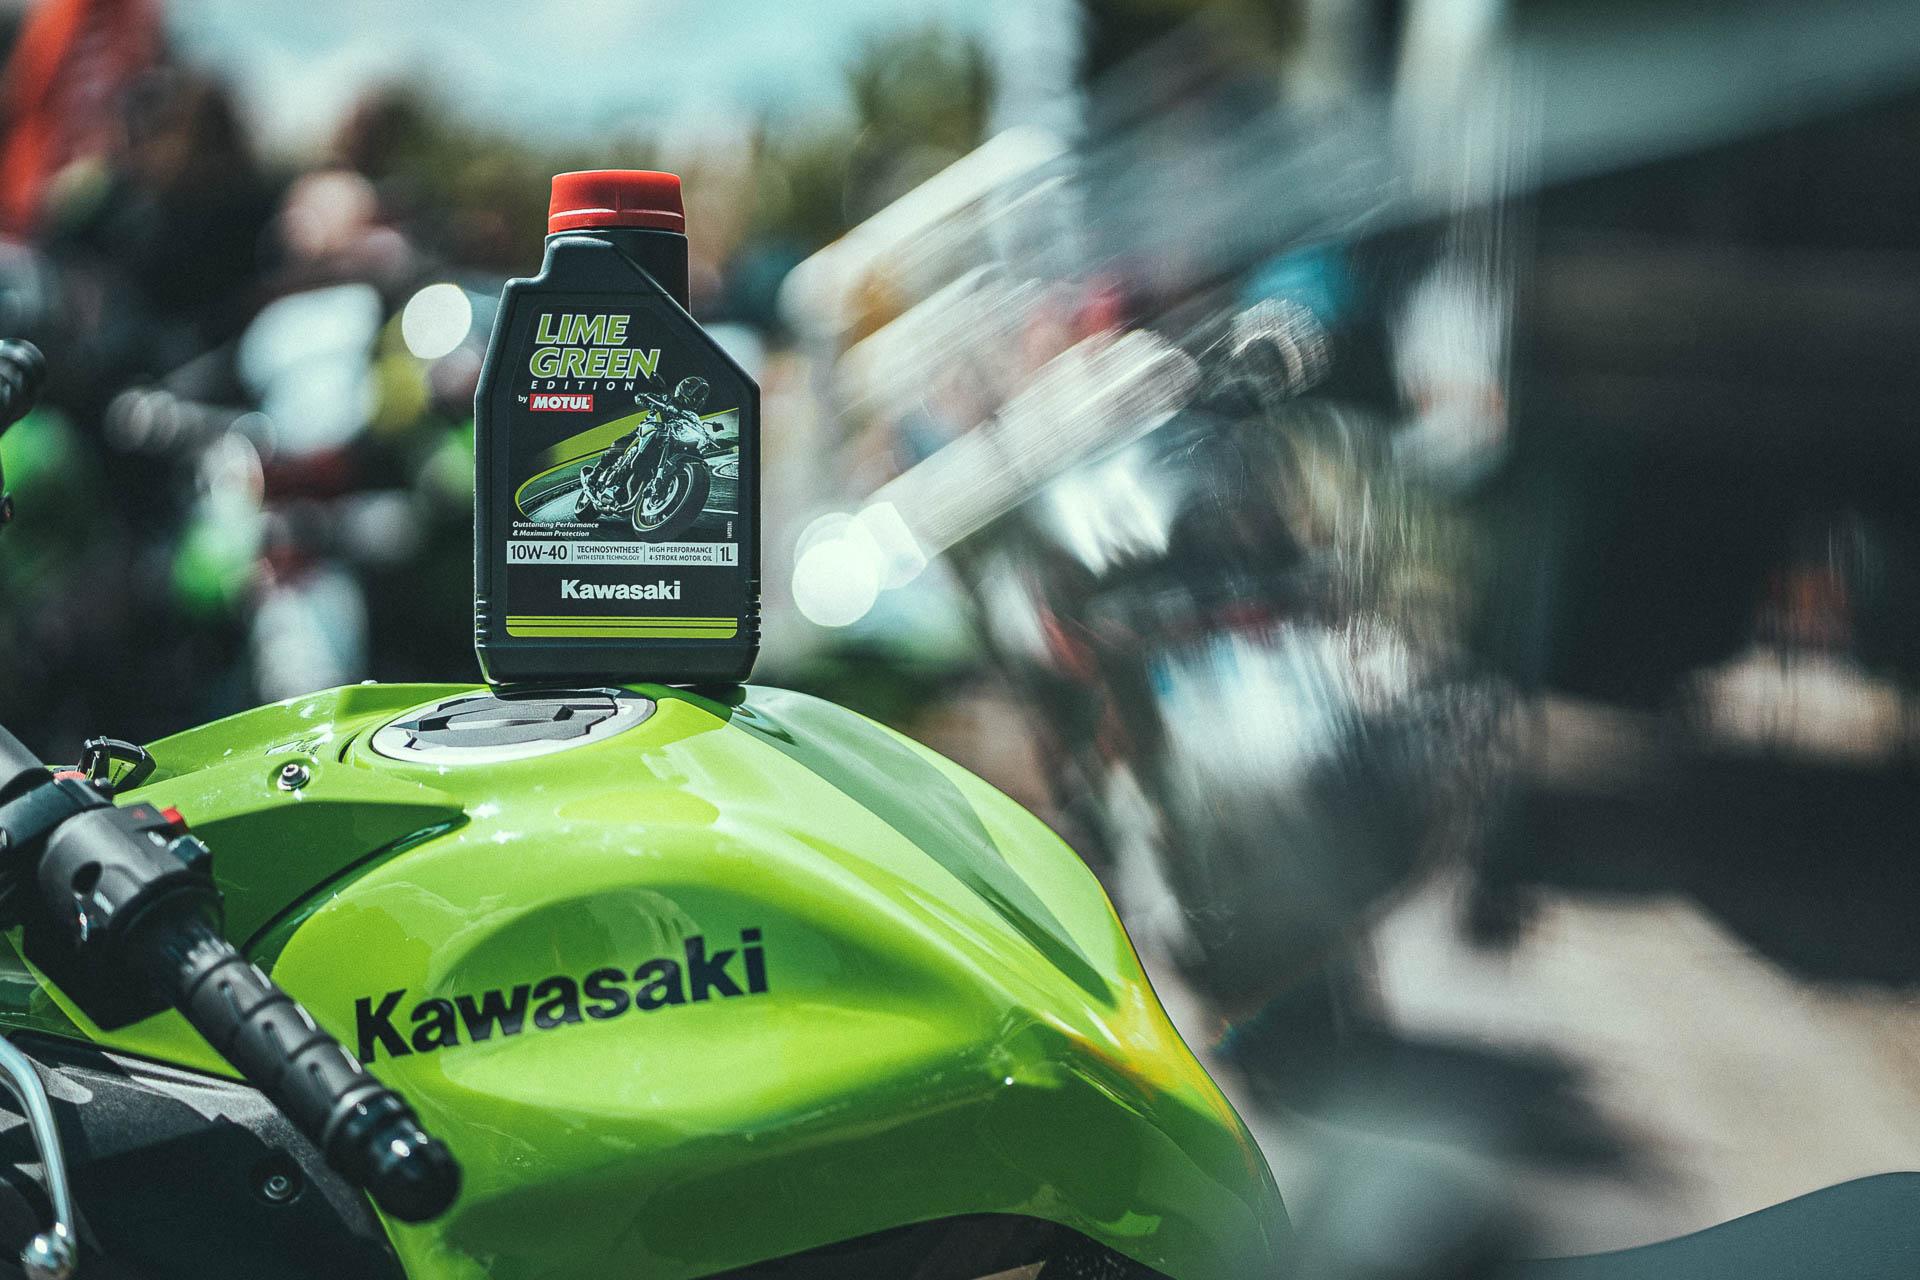 Kawasaki en Motul introduceren nieuwe motorolie